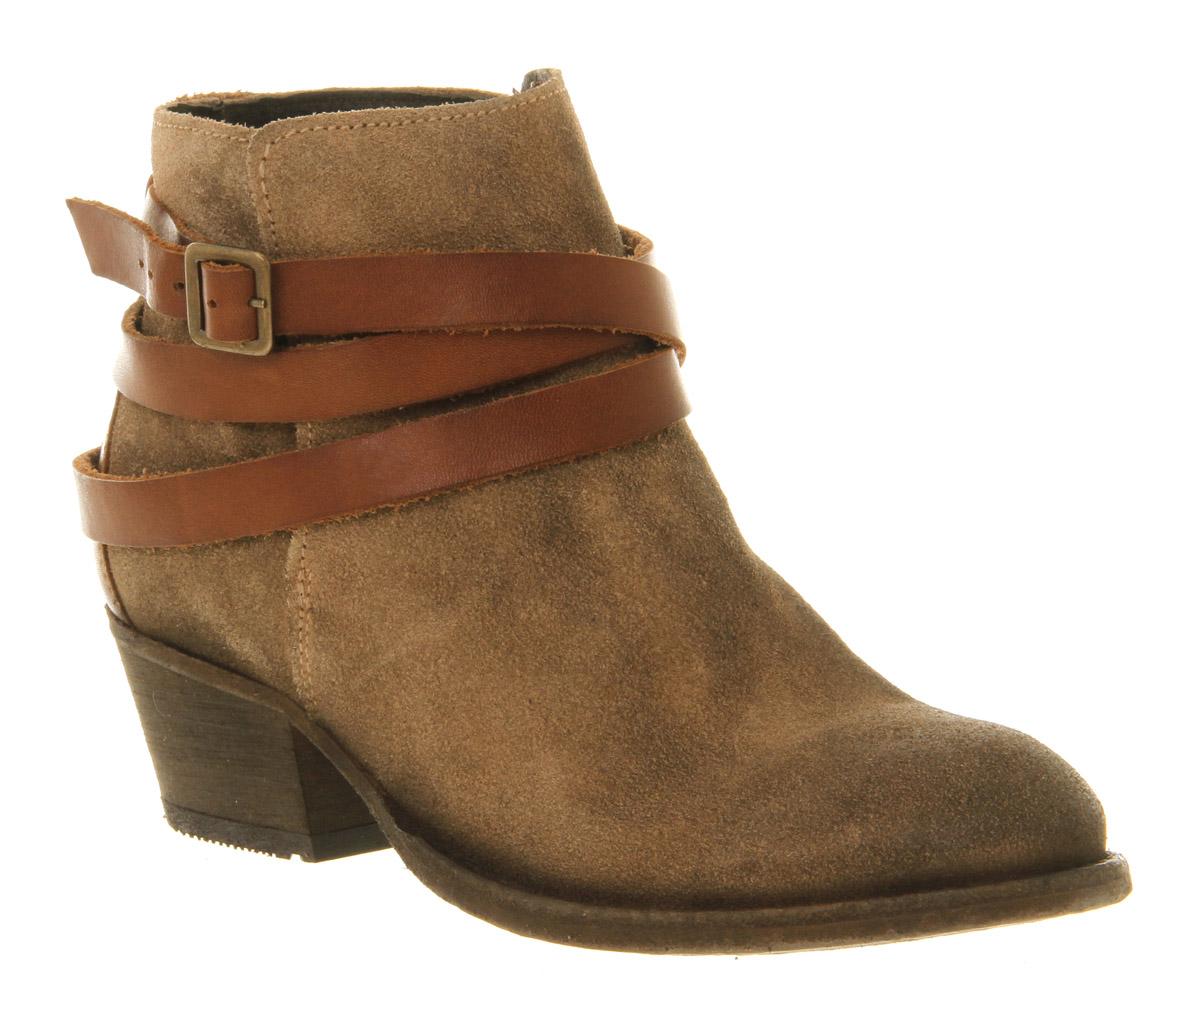 Womens-Hudson-Horrigan-Beige-Suede-Smu-Boots